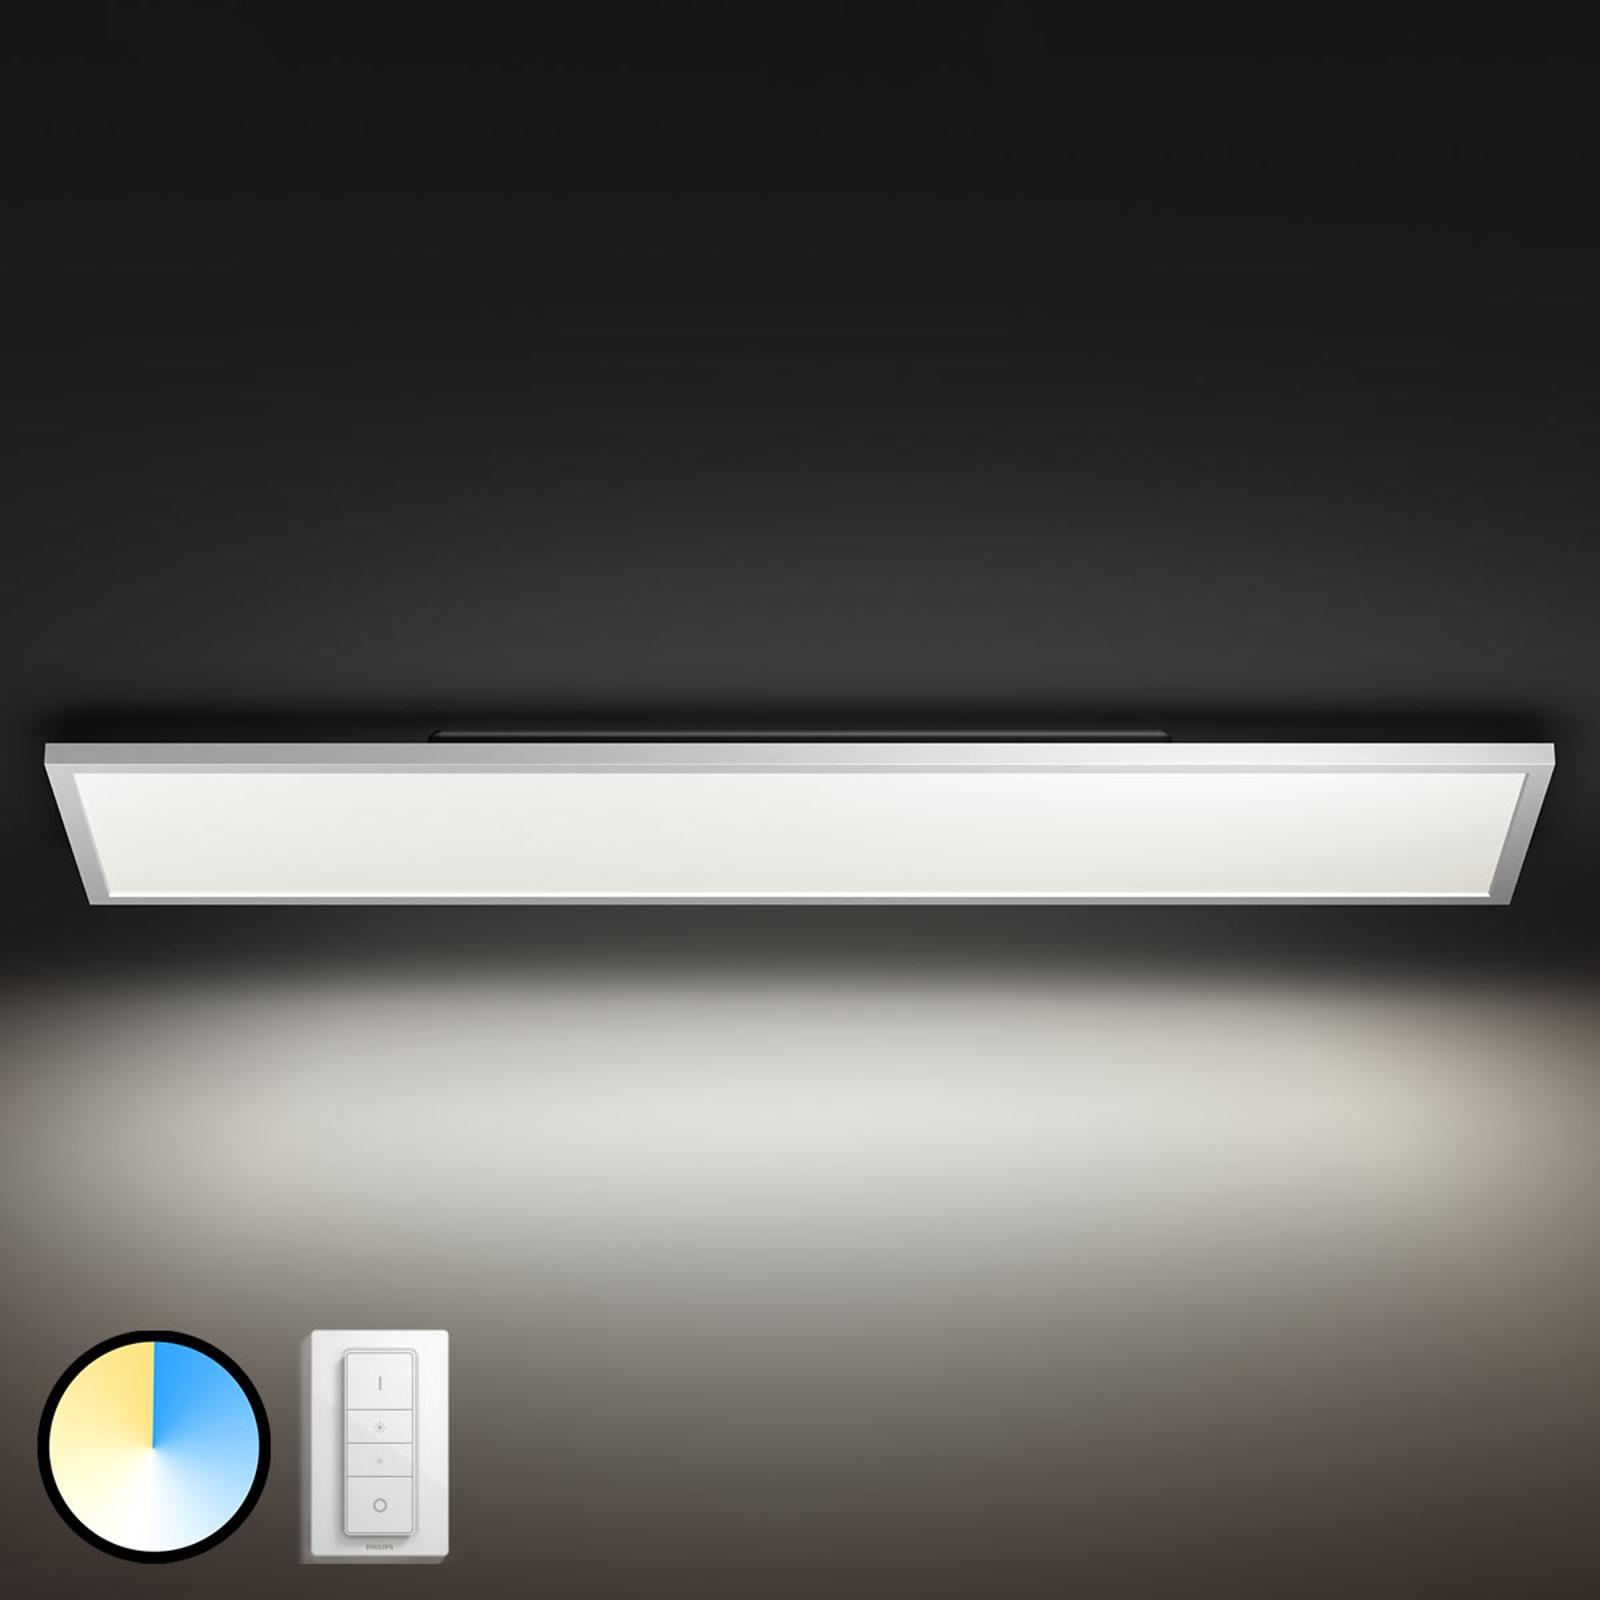 Philips Hue Aurelle LED-panel kantig, 120 x 30cm